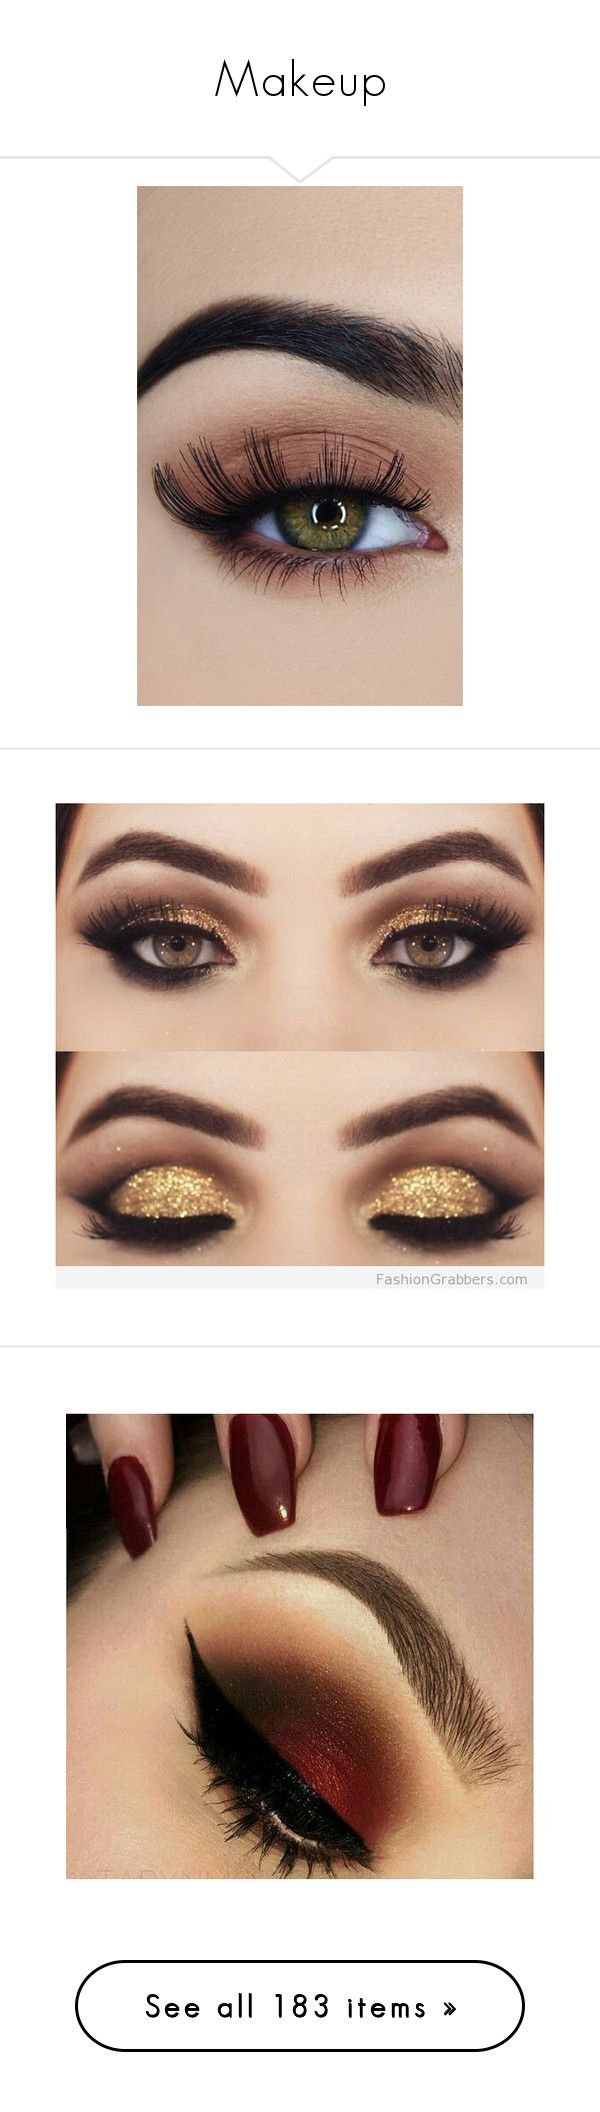 """Makeup"" by vanessa-joynelly on Polyvore featuring beauty products, makeup, eye makeup, false eyelashes, beauty, eyes, olho, black, eyeshadow e bath & beauty"